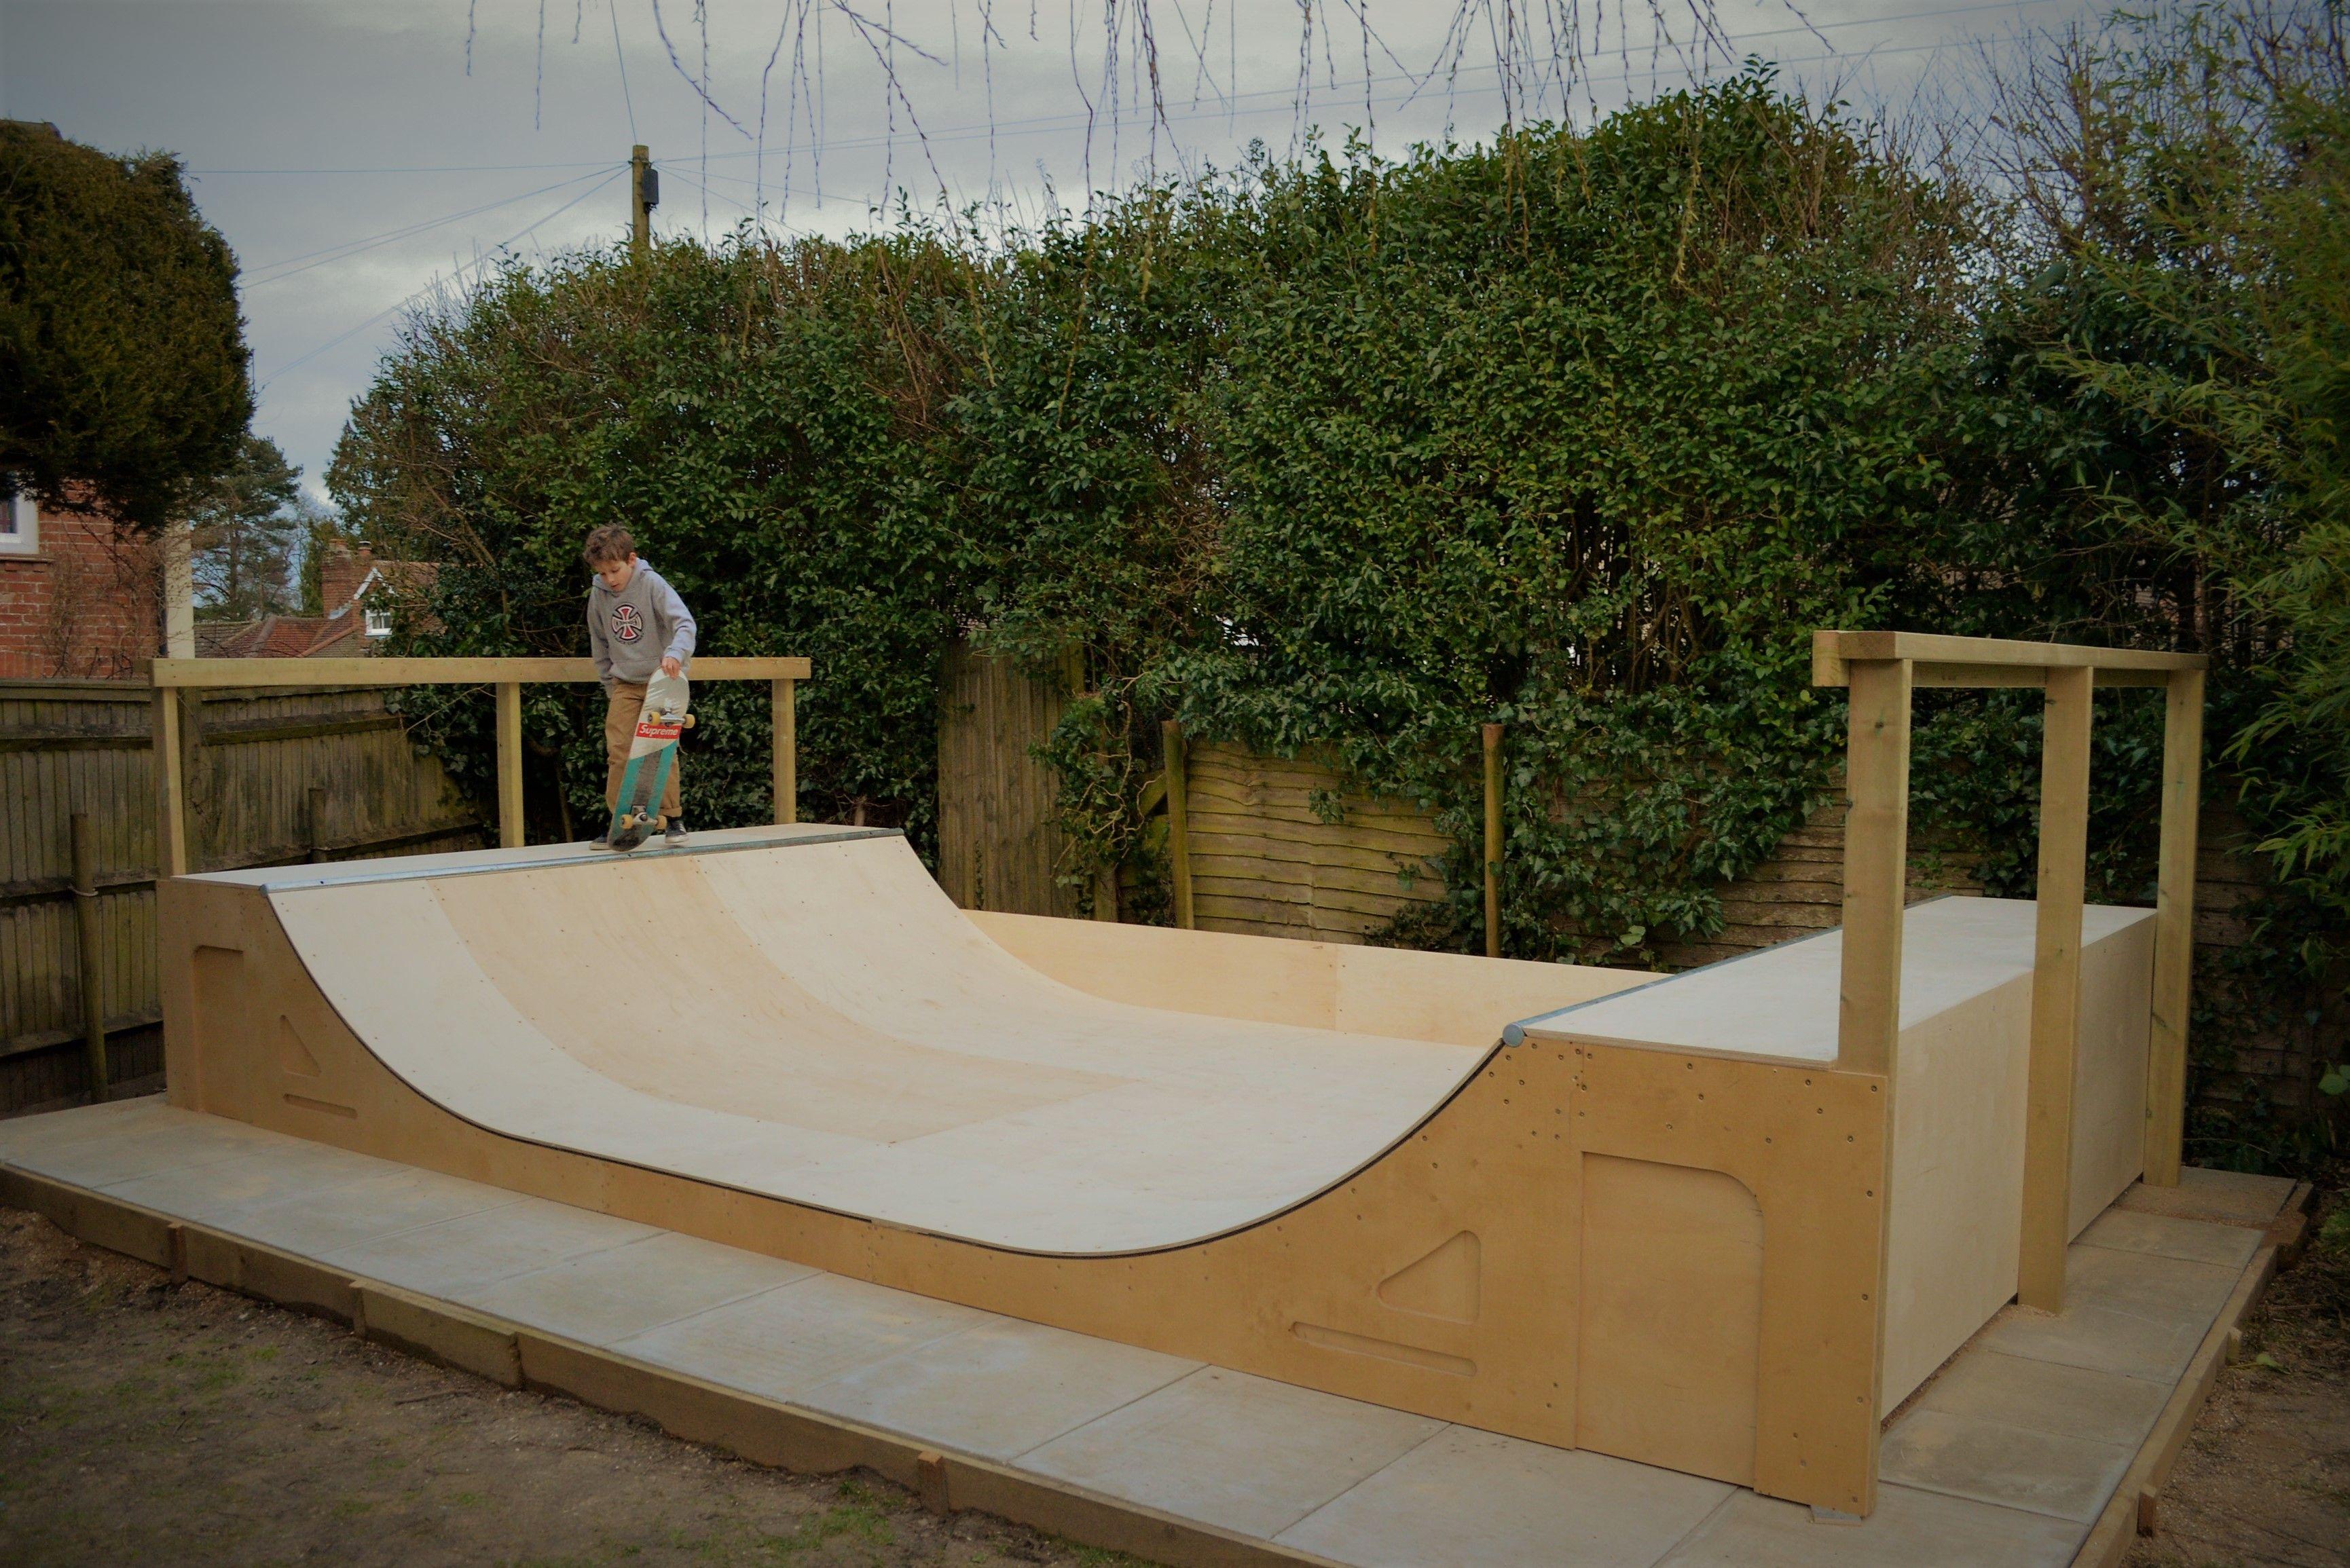 Diy Skate Ramp Kit Mini Ramp Kit For Easy Self Build Skate Ramp Mini Ramp Backyard Skatepark